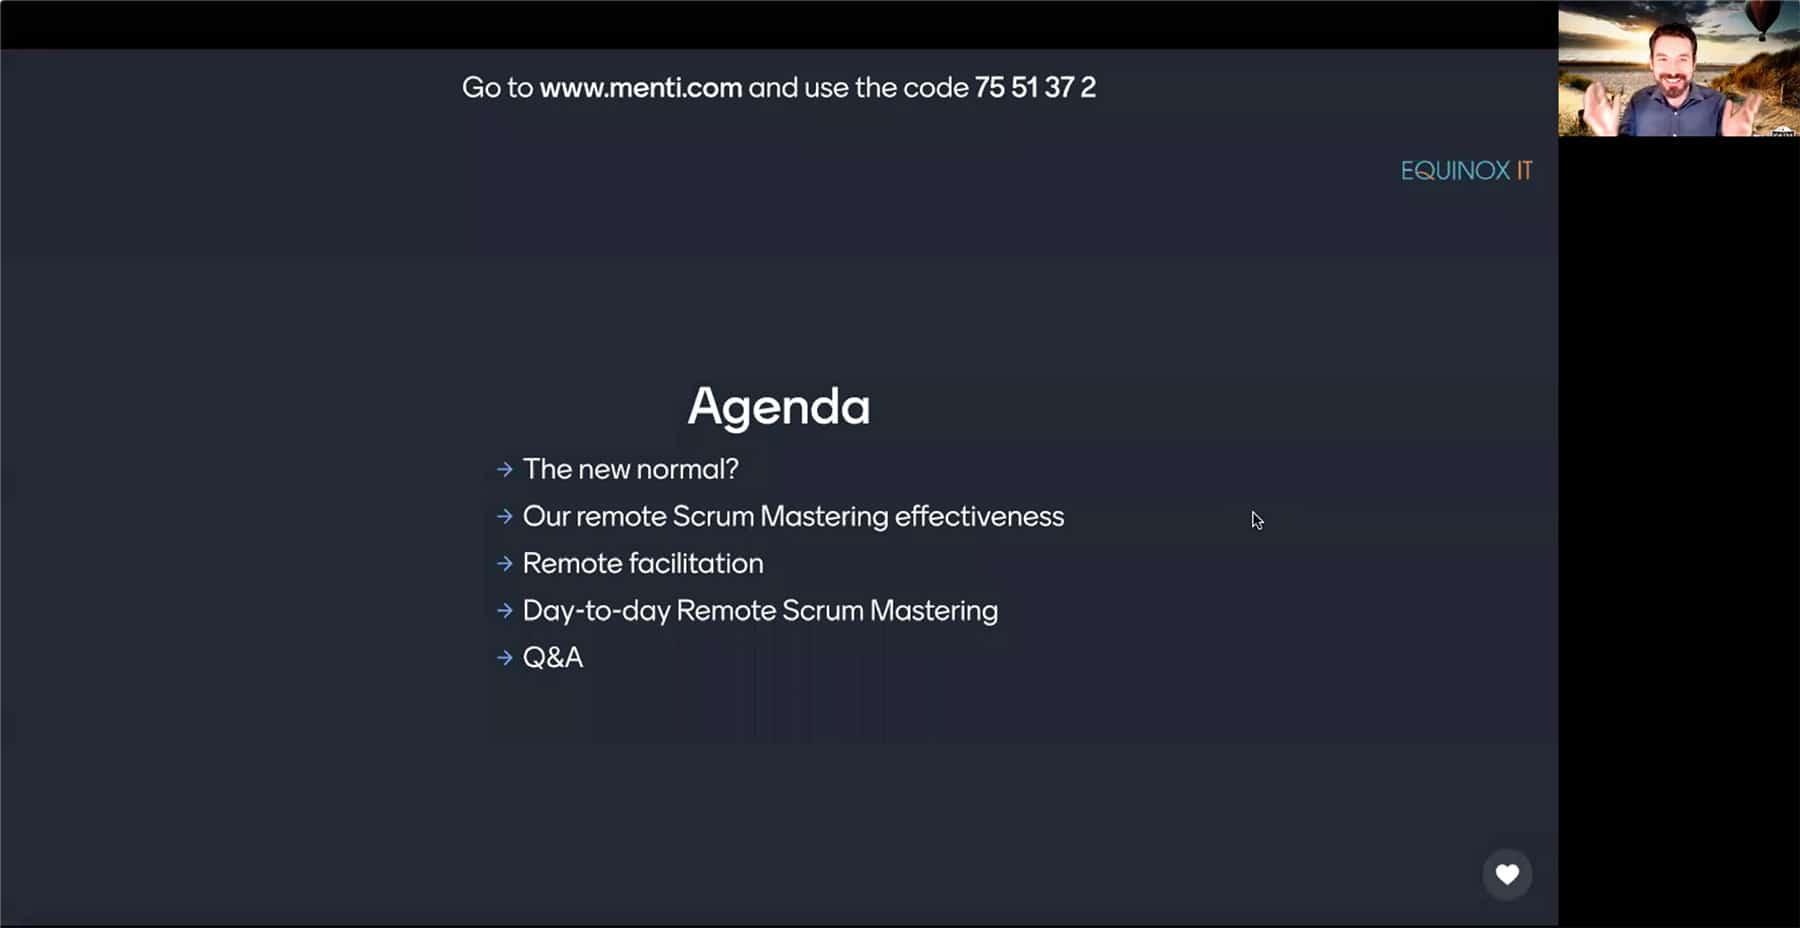 Webinar Agenda screencap